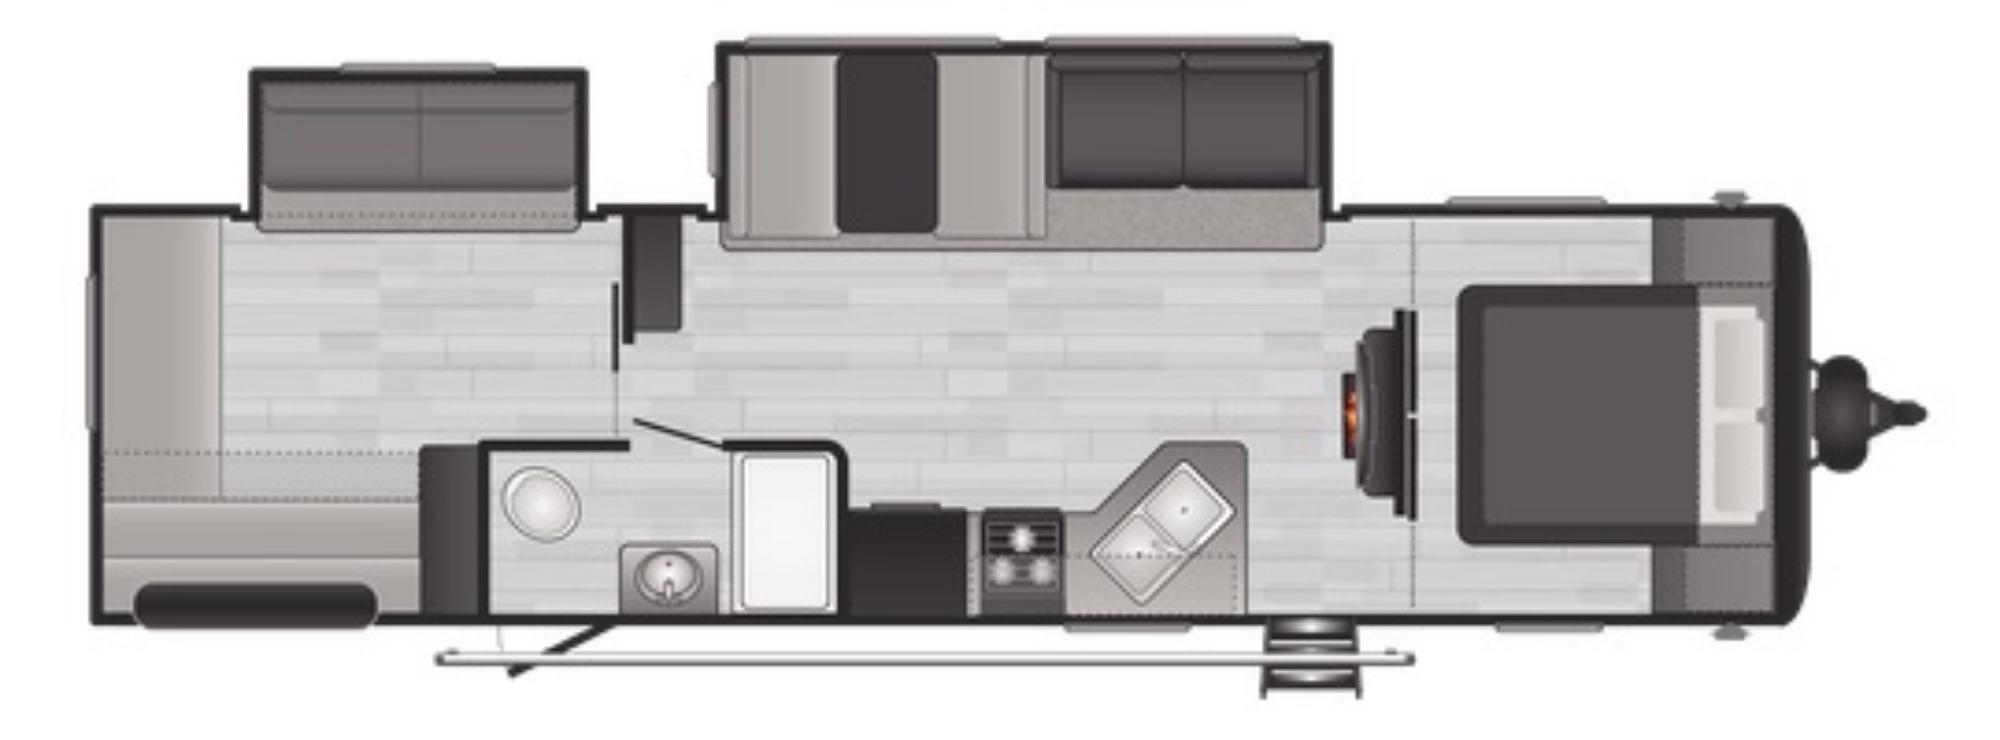 View Floor Plan for 2021 KEYSTONE HIDEOUT 318BR